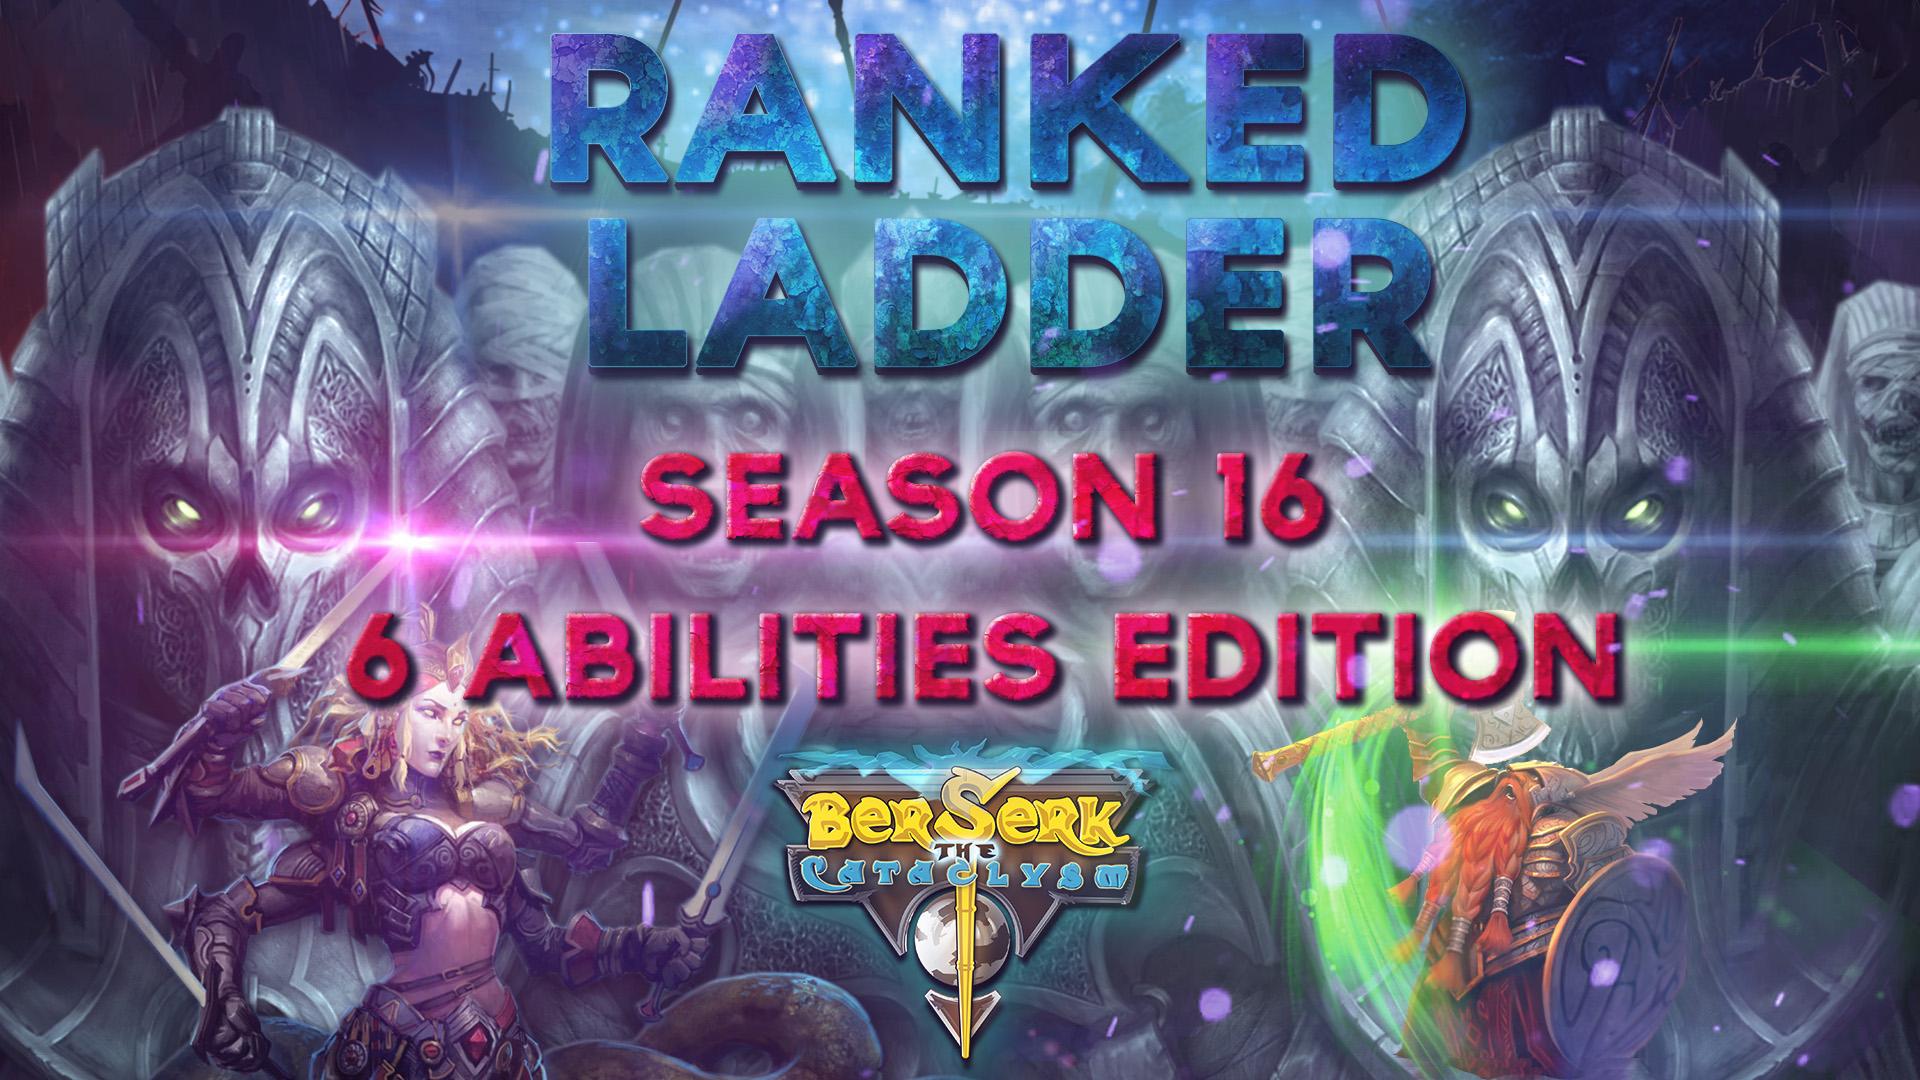 Ranked_LAdder_Season_16.jpg